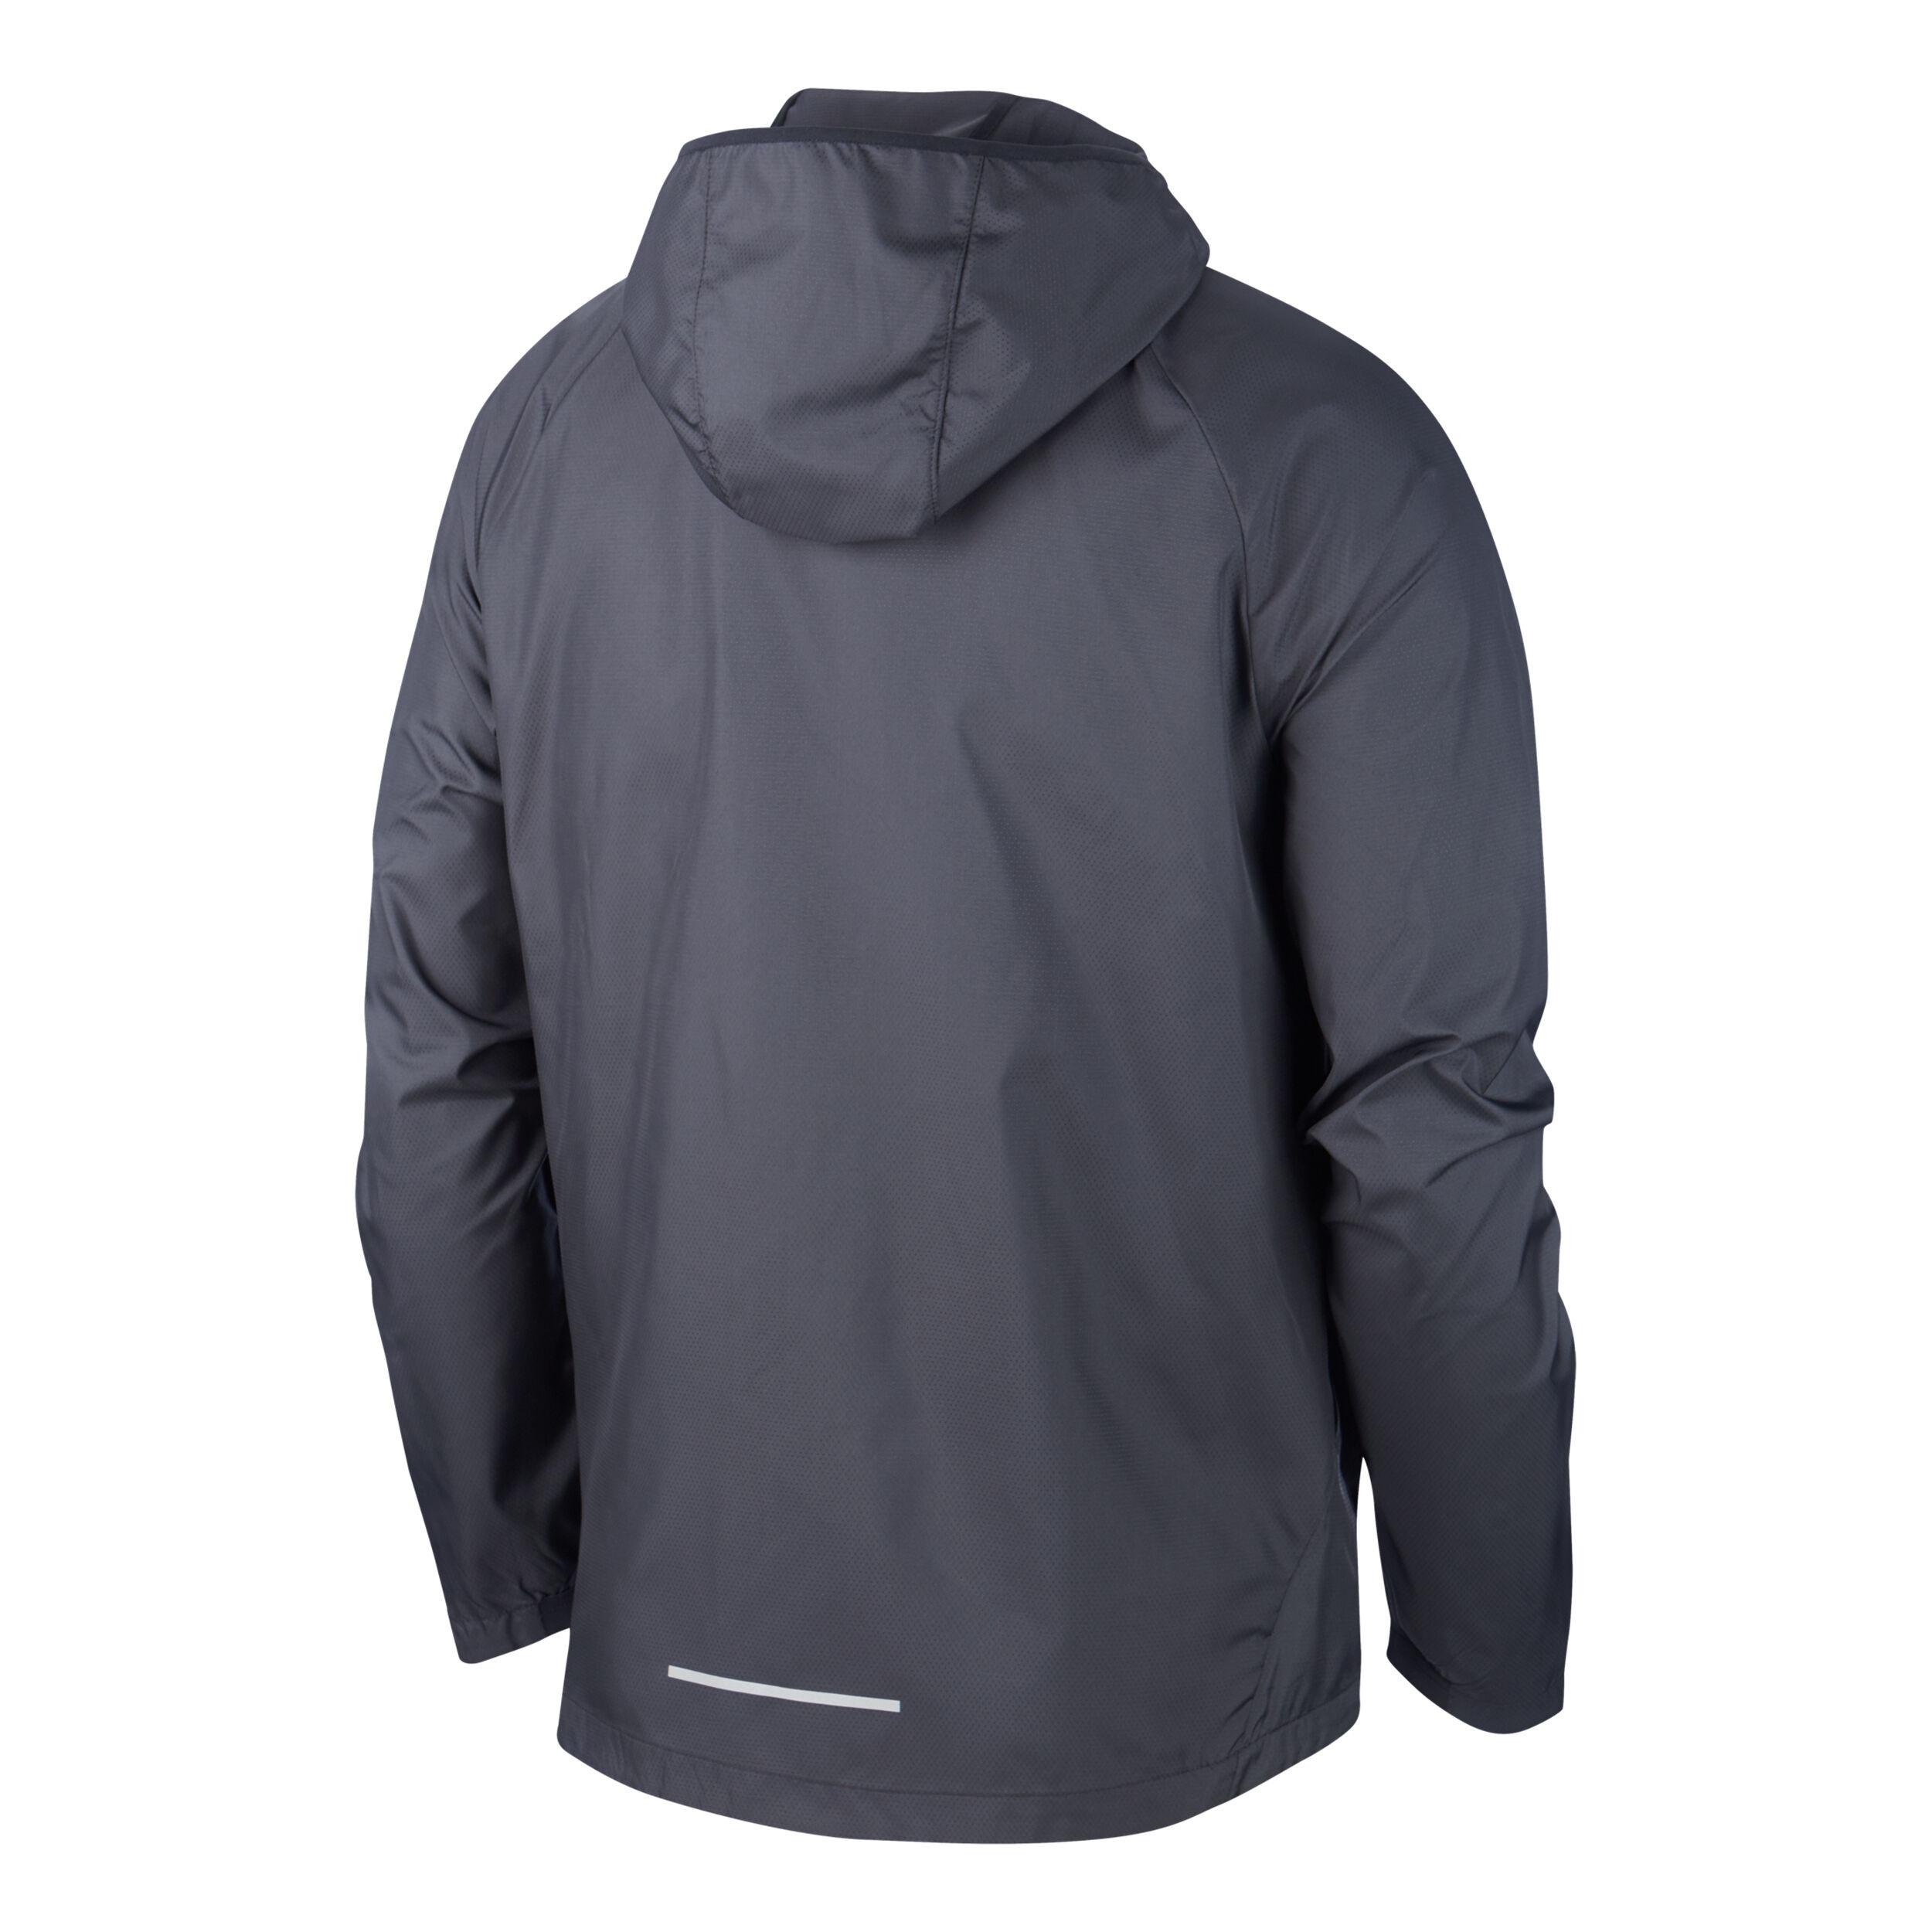 Nike Air Pro Essential Trainingsjacke Herren Schwarz, Silber